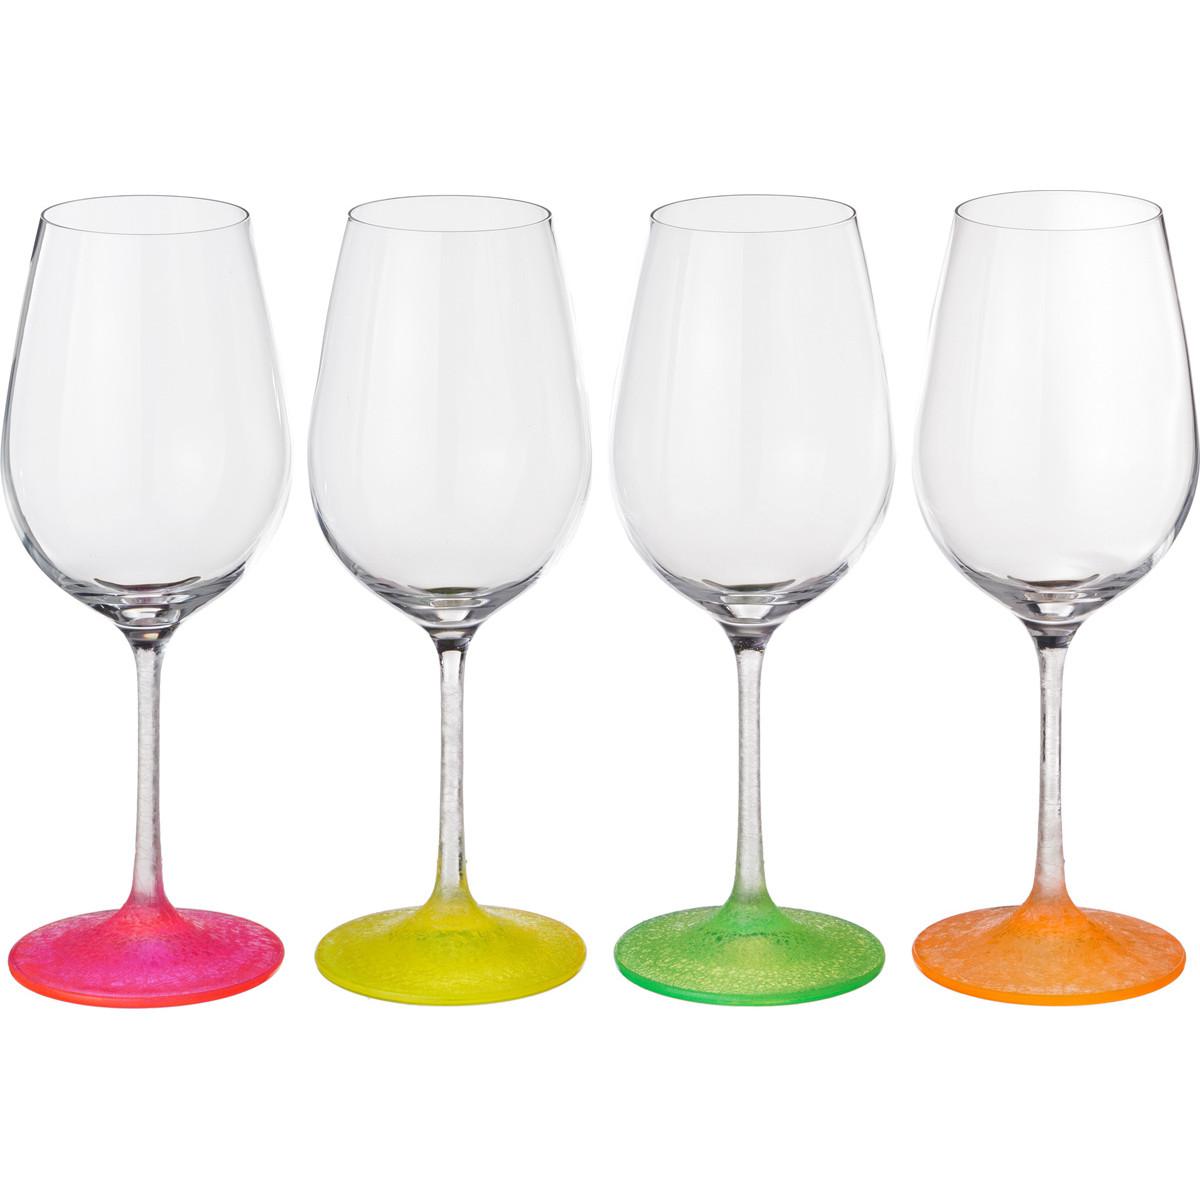 {} Bohemia Crystal Набор бокалов для вина Evonne  (23 см - 4 шт) набор для кофе crystal bohemia mokko 4 предмета